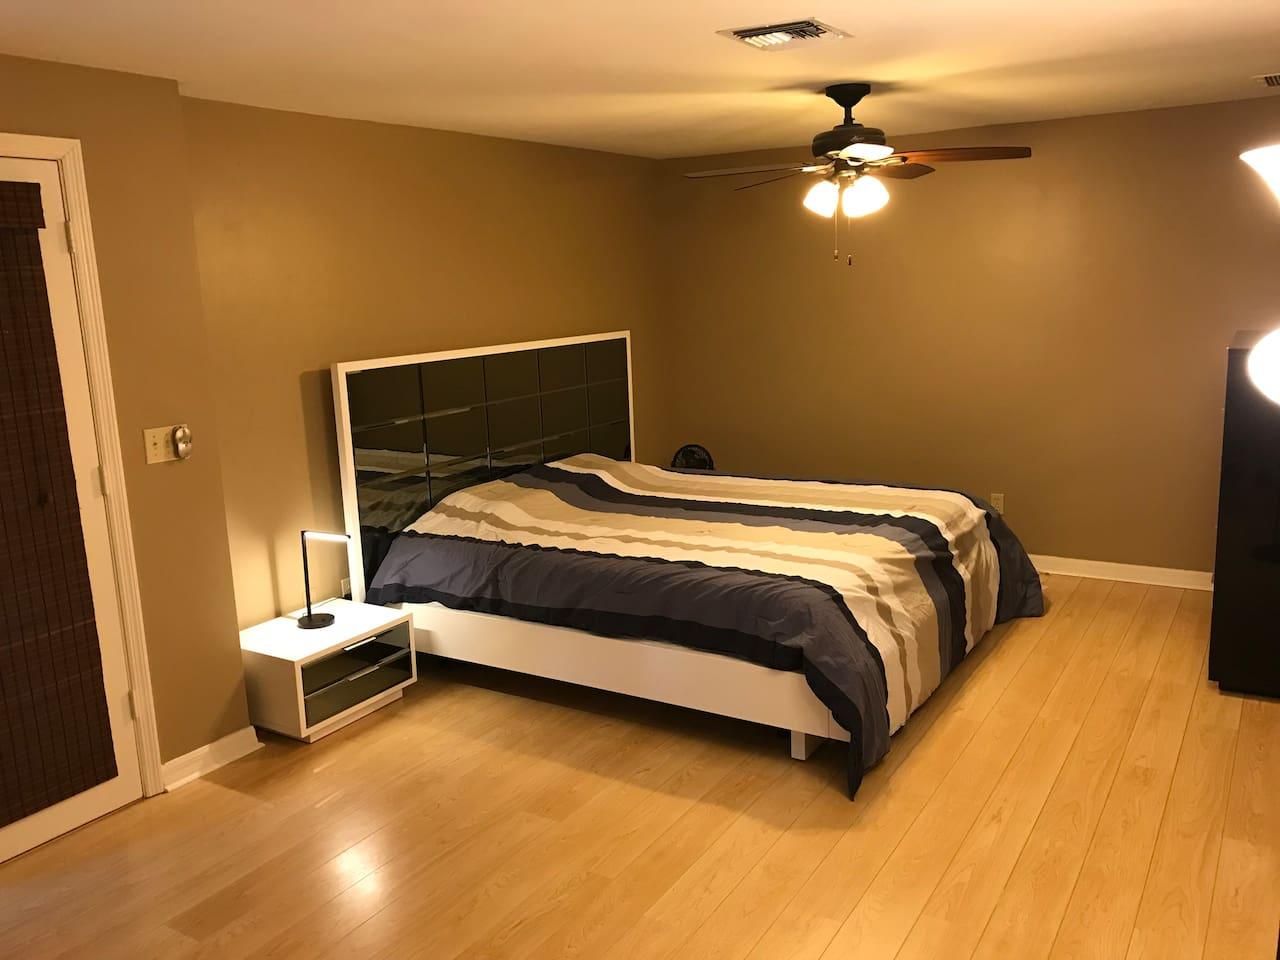 King size mattress (temperpudic)